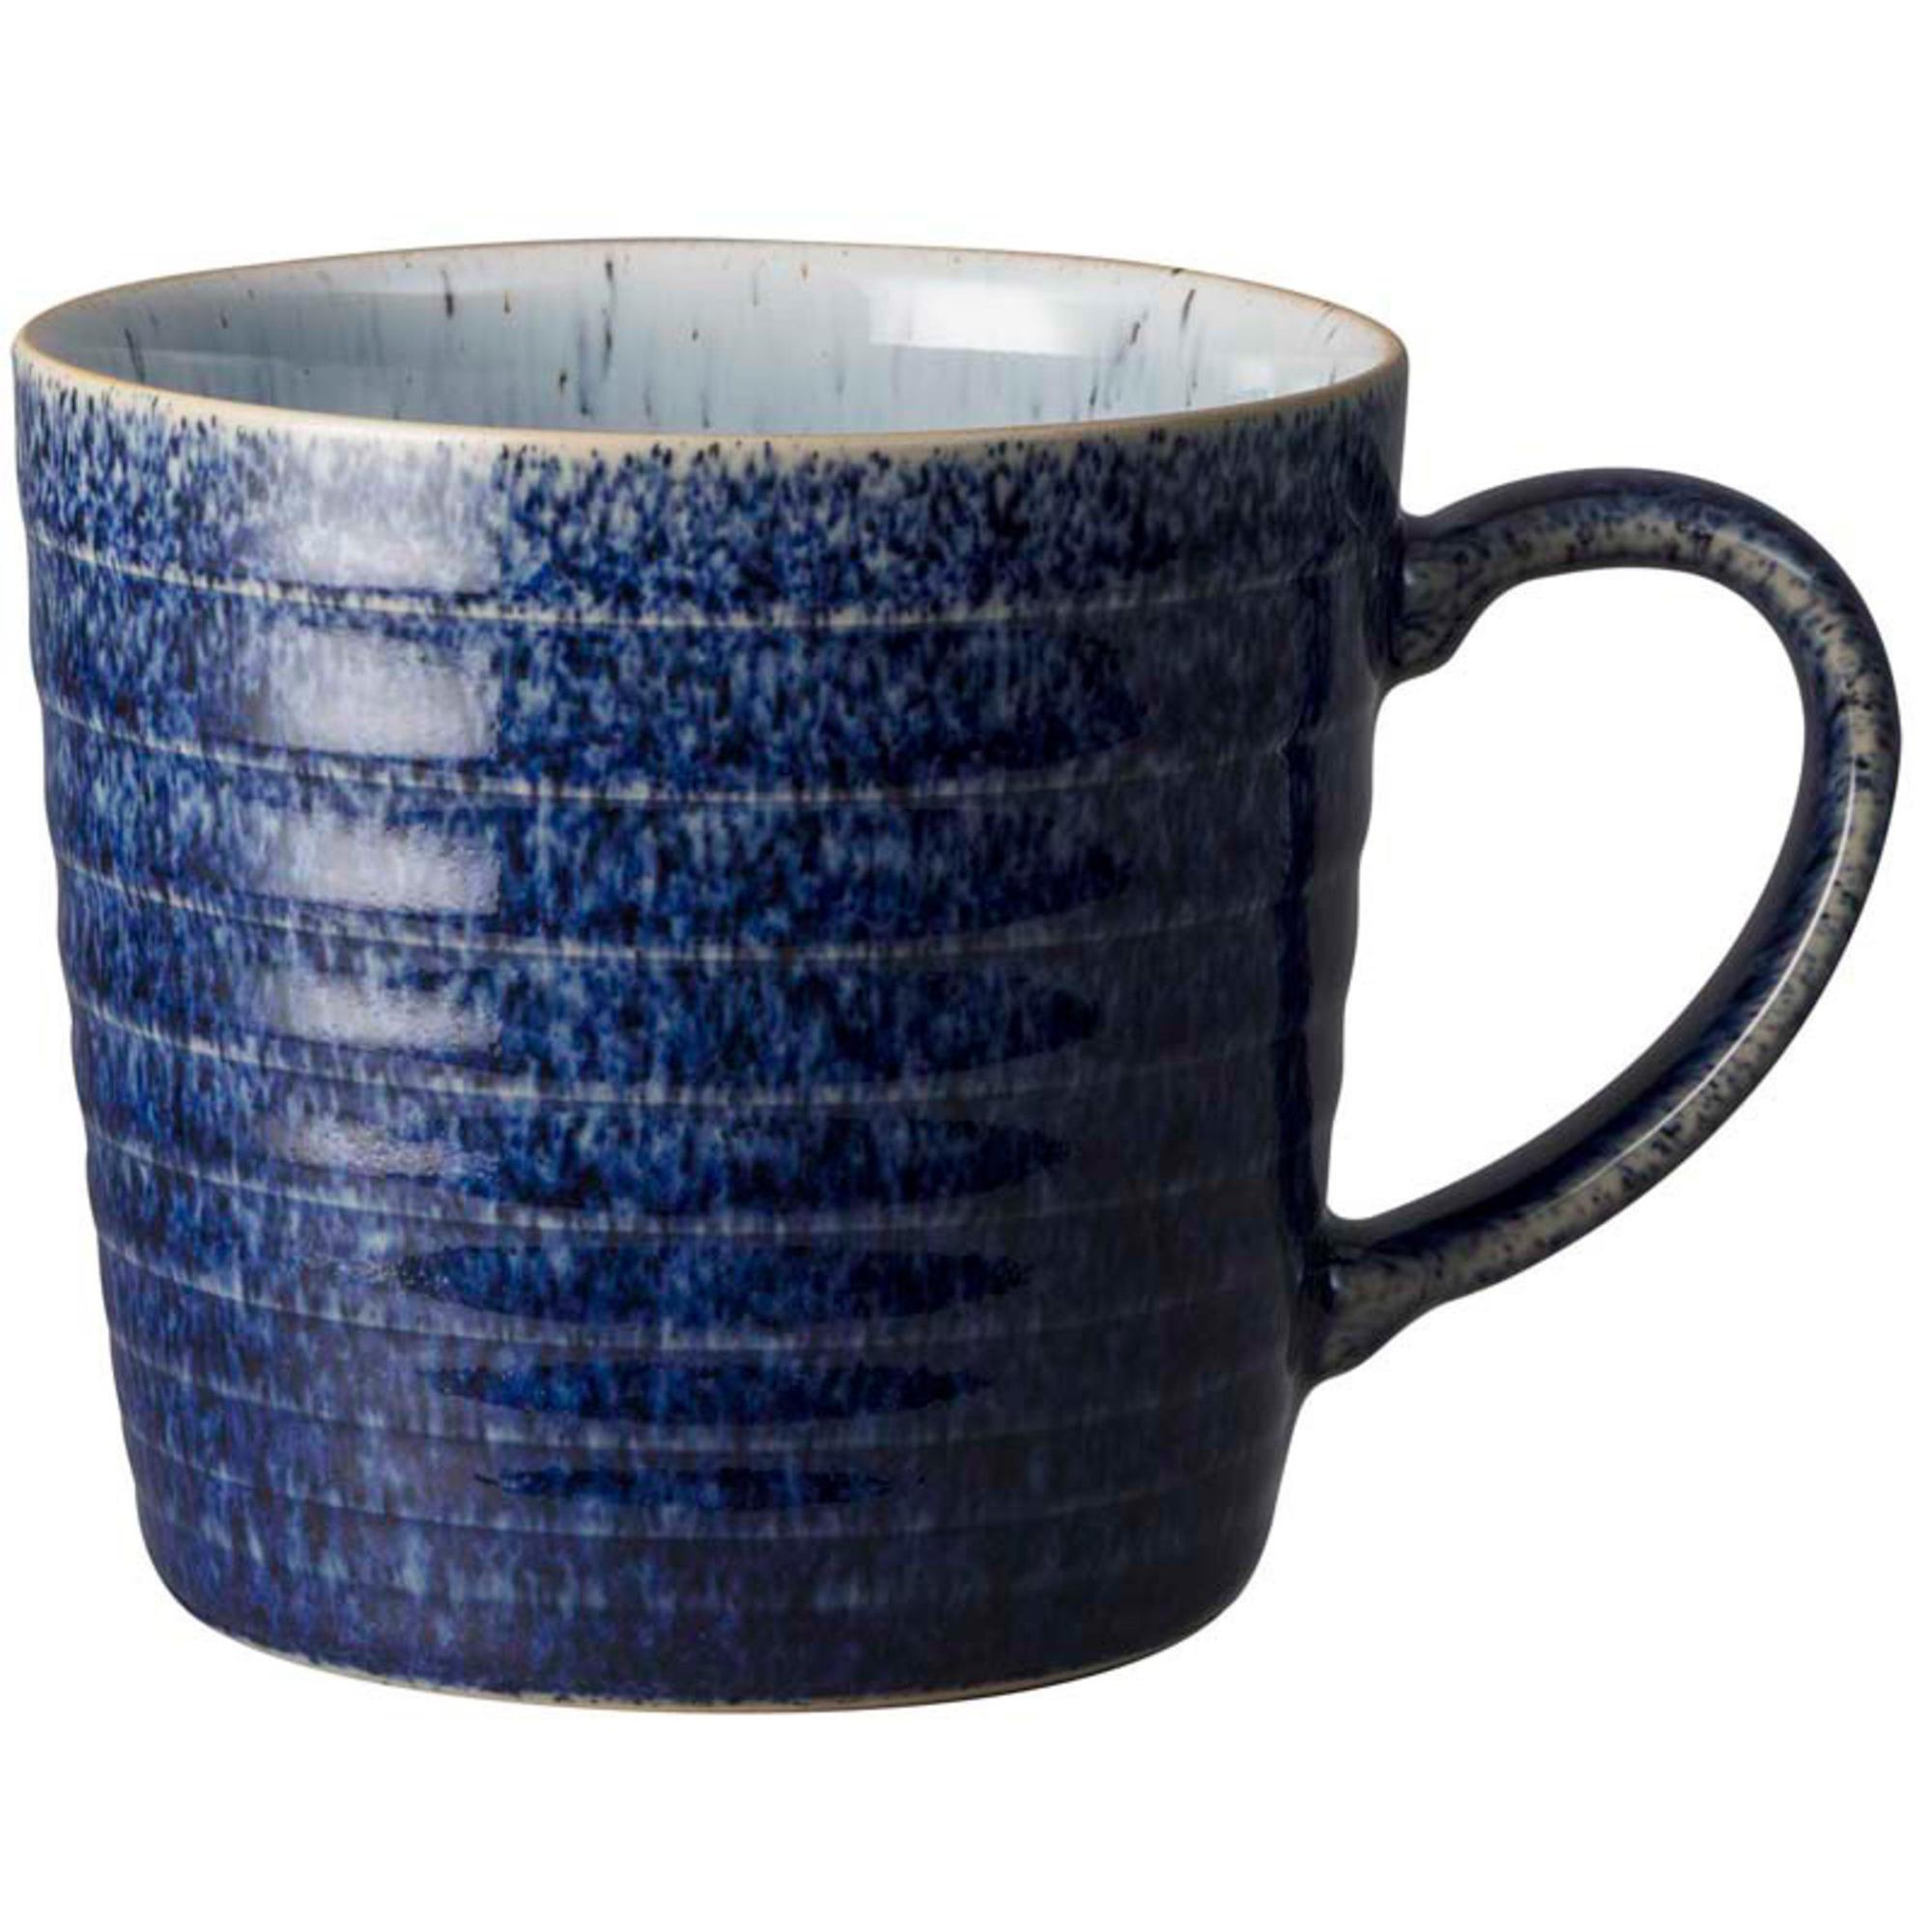 Denby Studio Blue Ridged Mugg 40 cl, Cobalt/ Pebbl